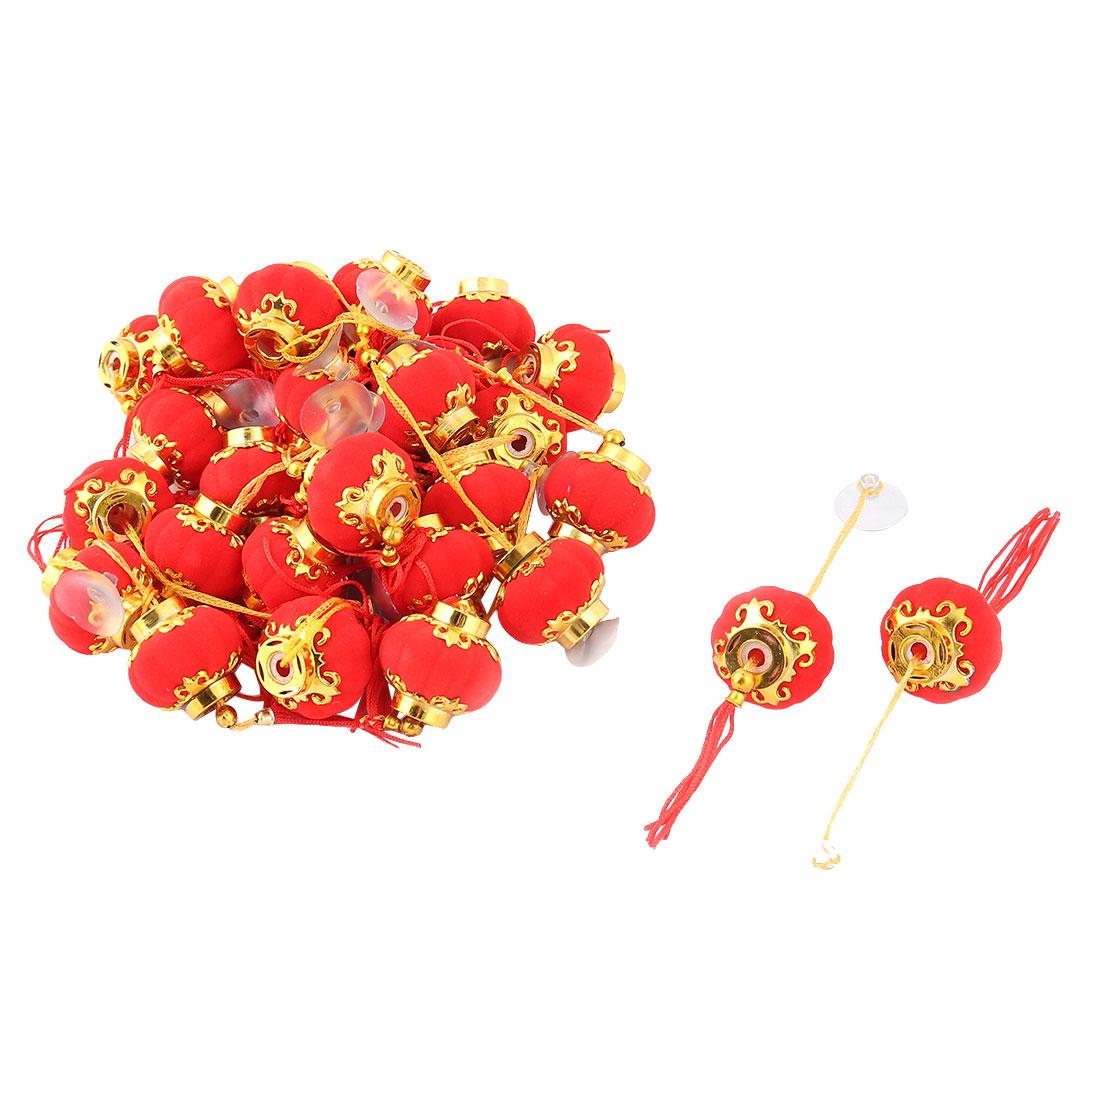 Gold Tone Hem Tassels Decor Suction Cup Chinese Red Lantern Adorn x 30